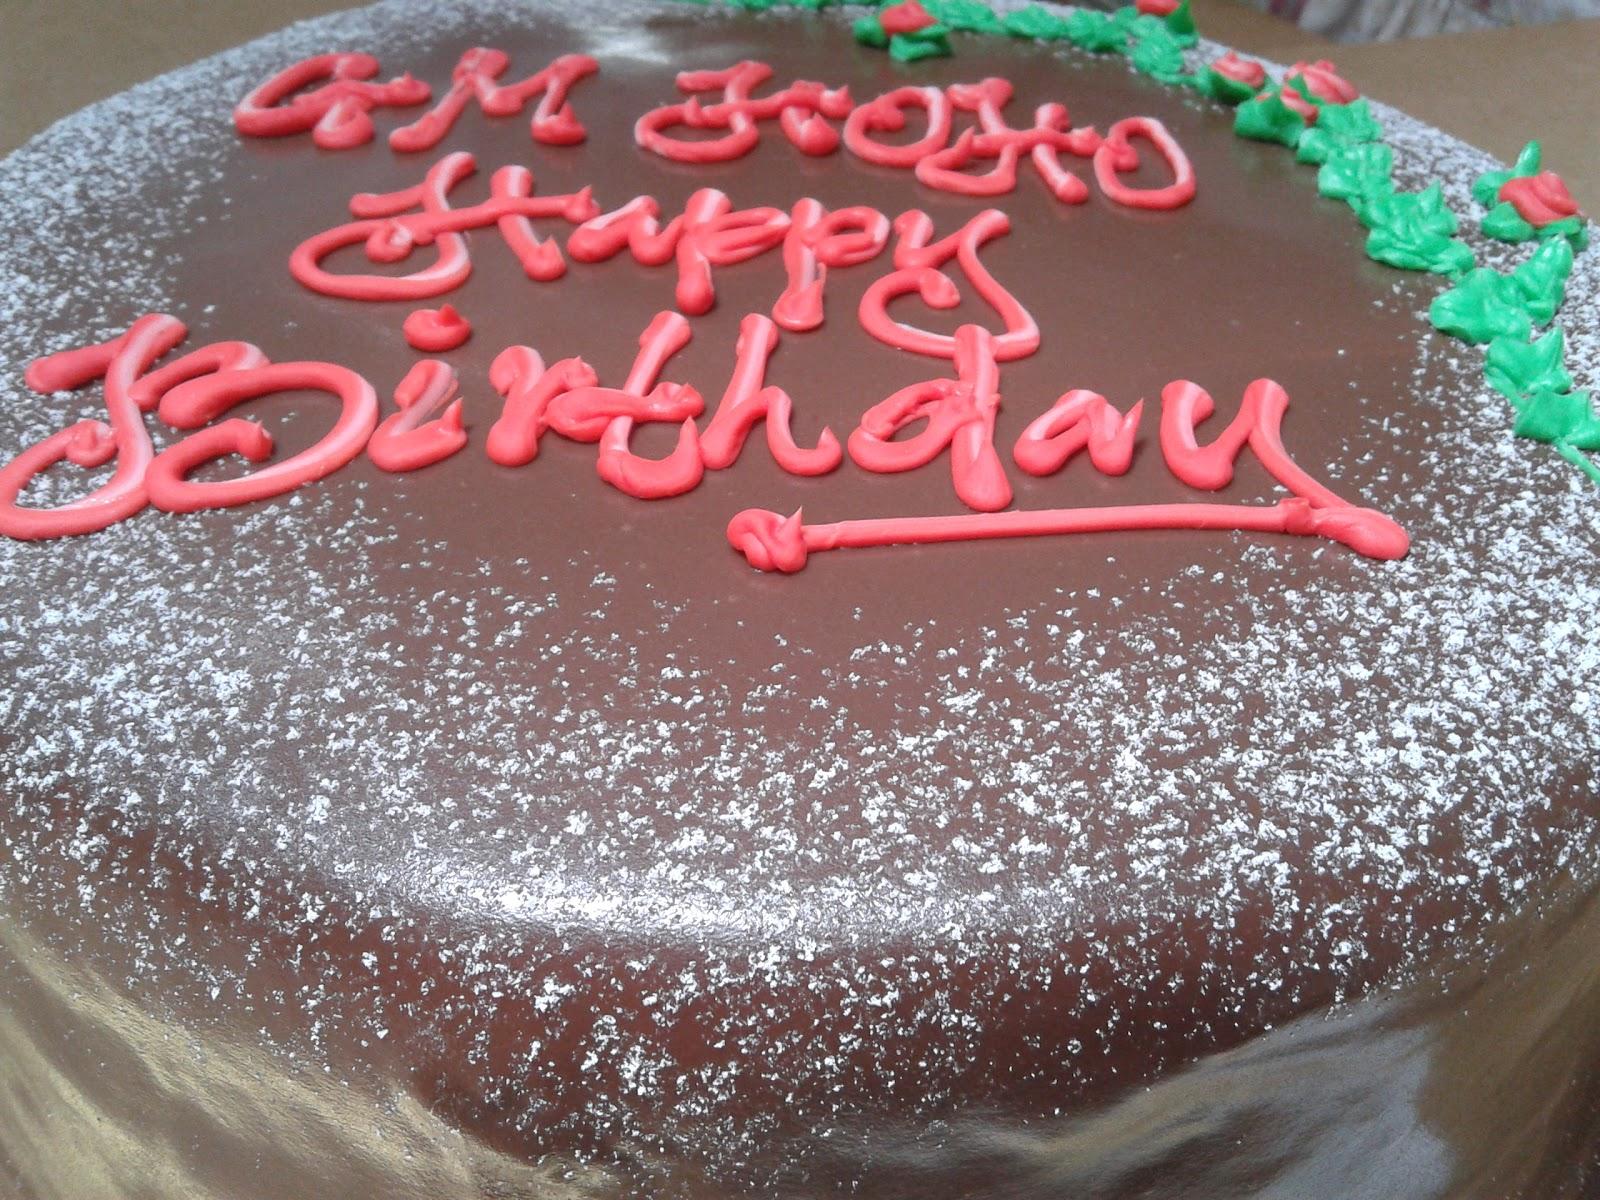 Missymiyen: Chocolate Indulgence & Skinny s Belated Birthday